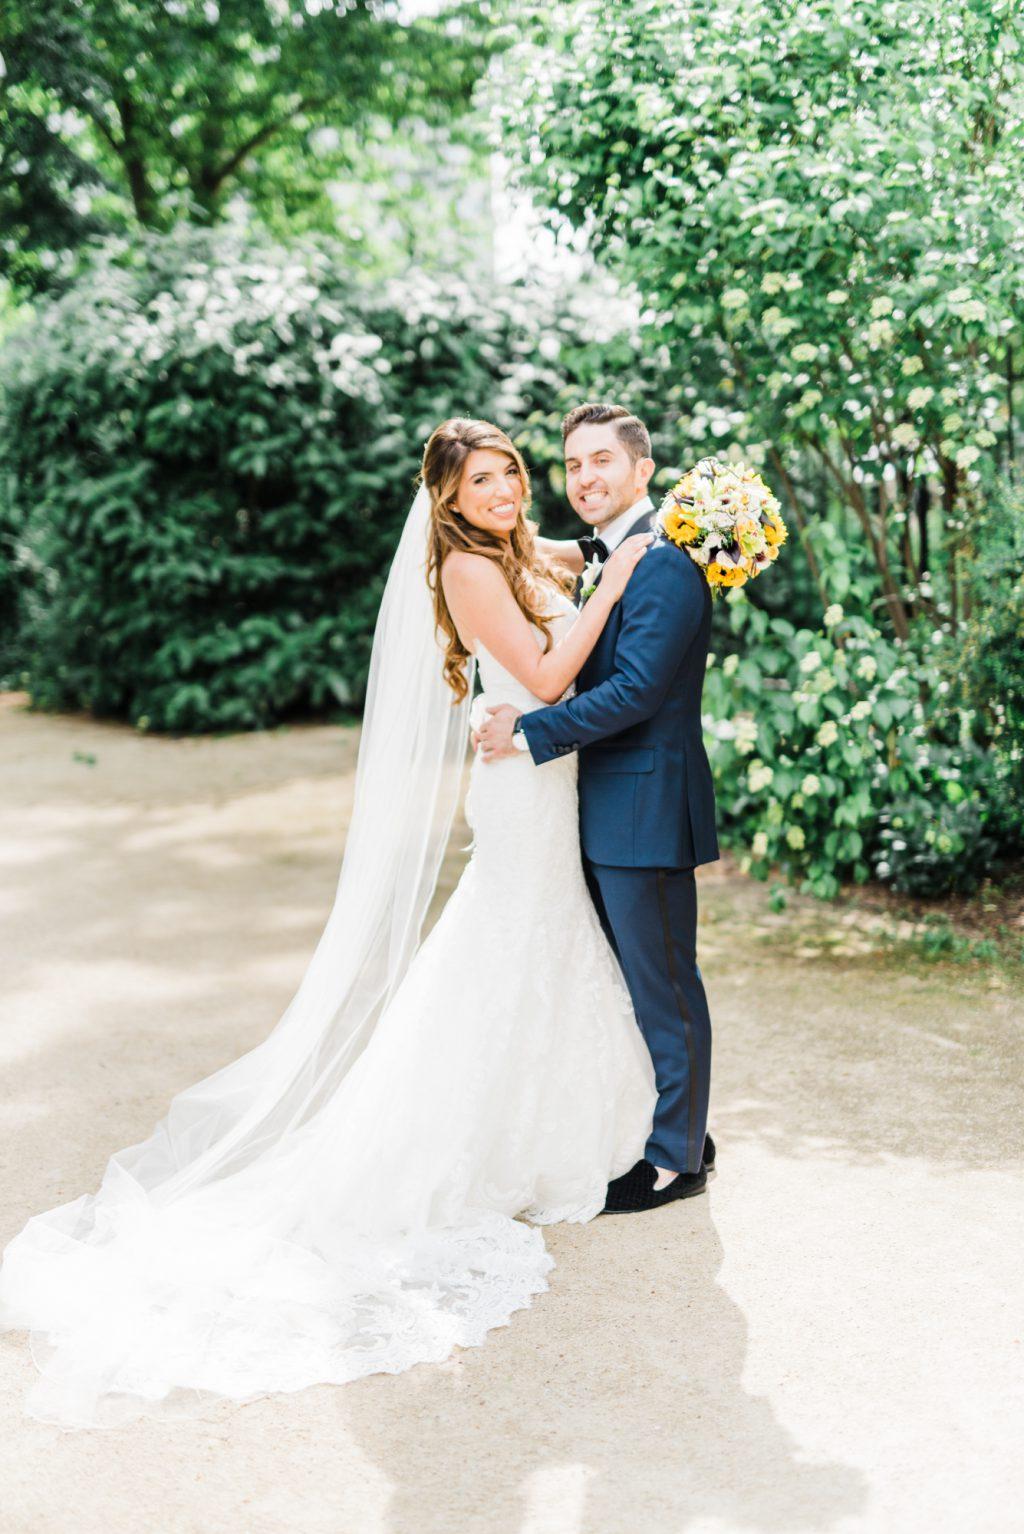 haleyrichterphoto-front-and-palmer-spring-wedding-rodin-museum-loews-hotel-philadelphia-085